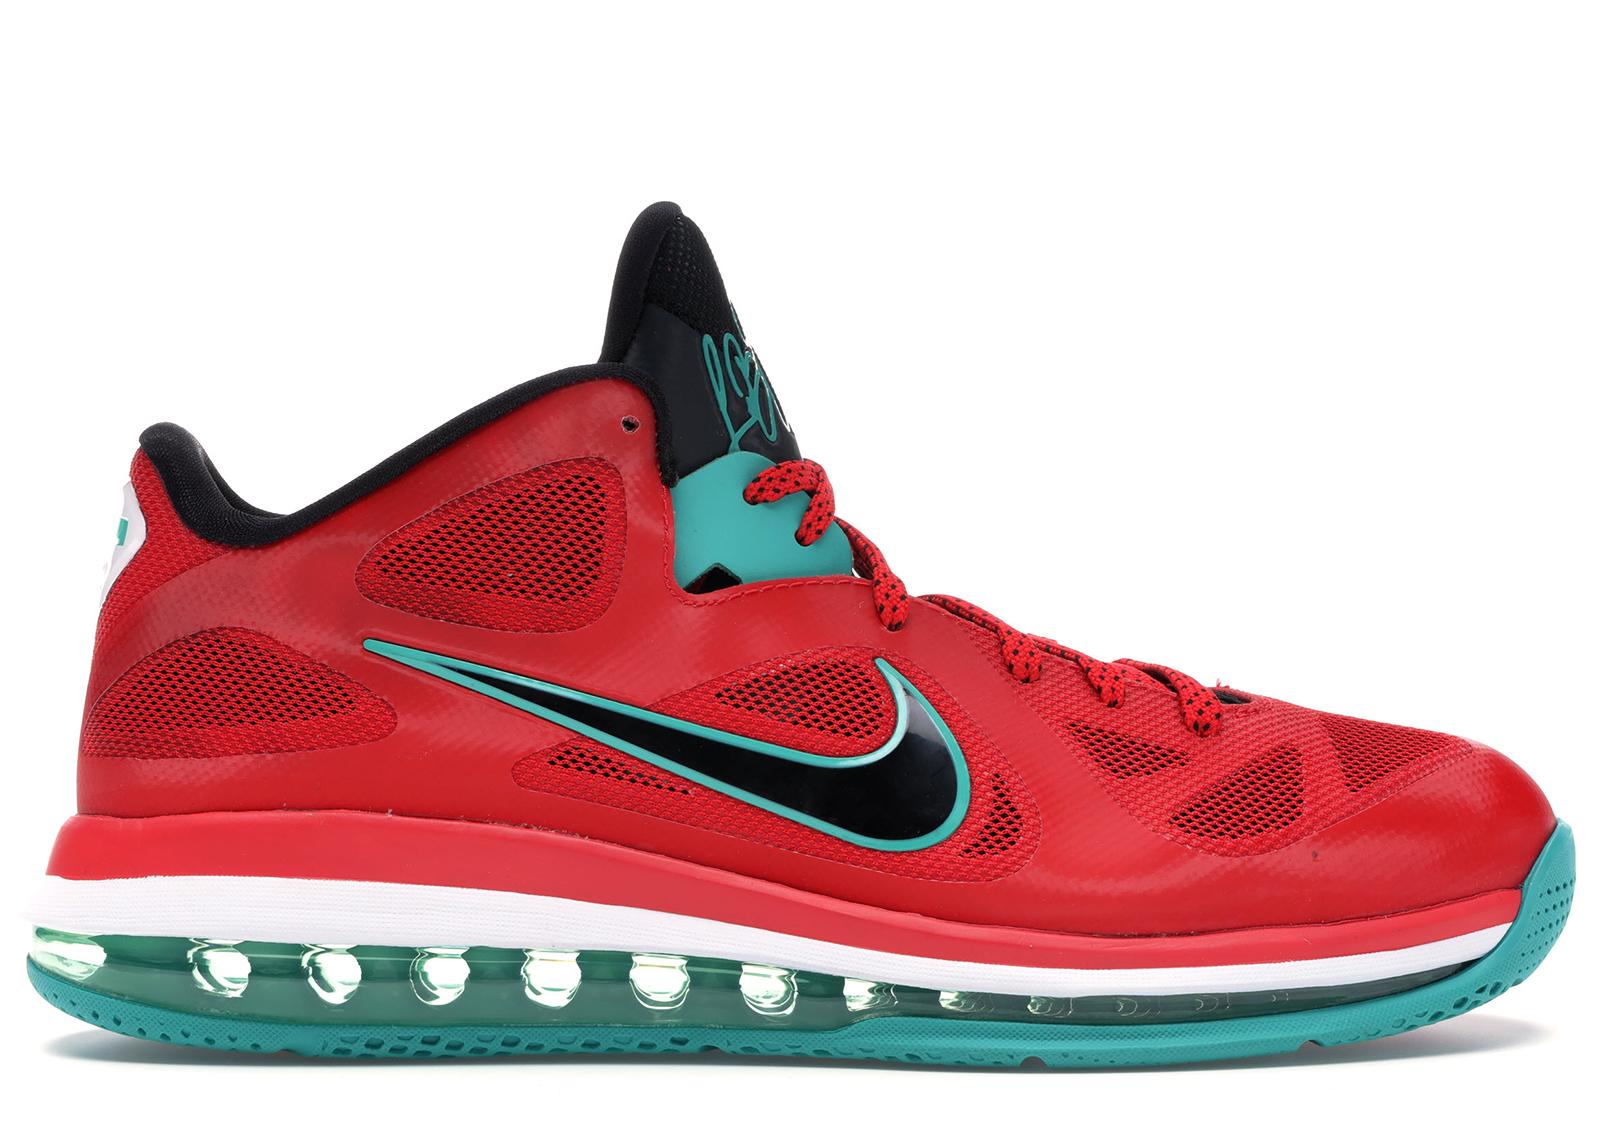 Nike LeBron 9 Low Liverpool - 510811-601